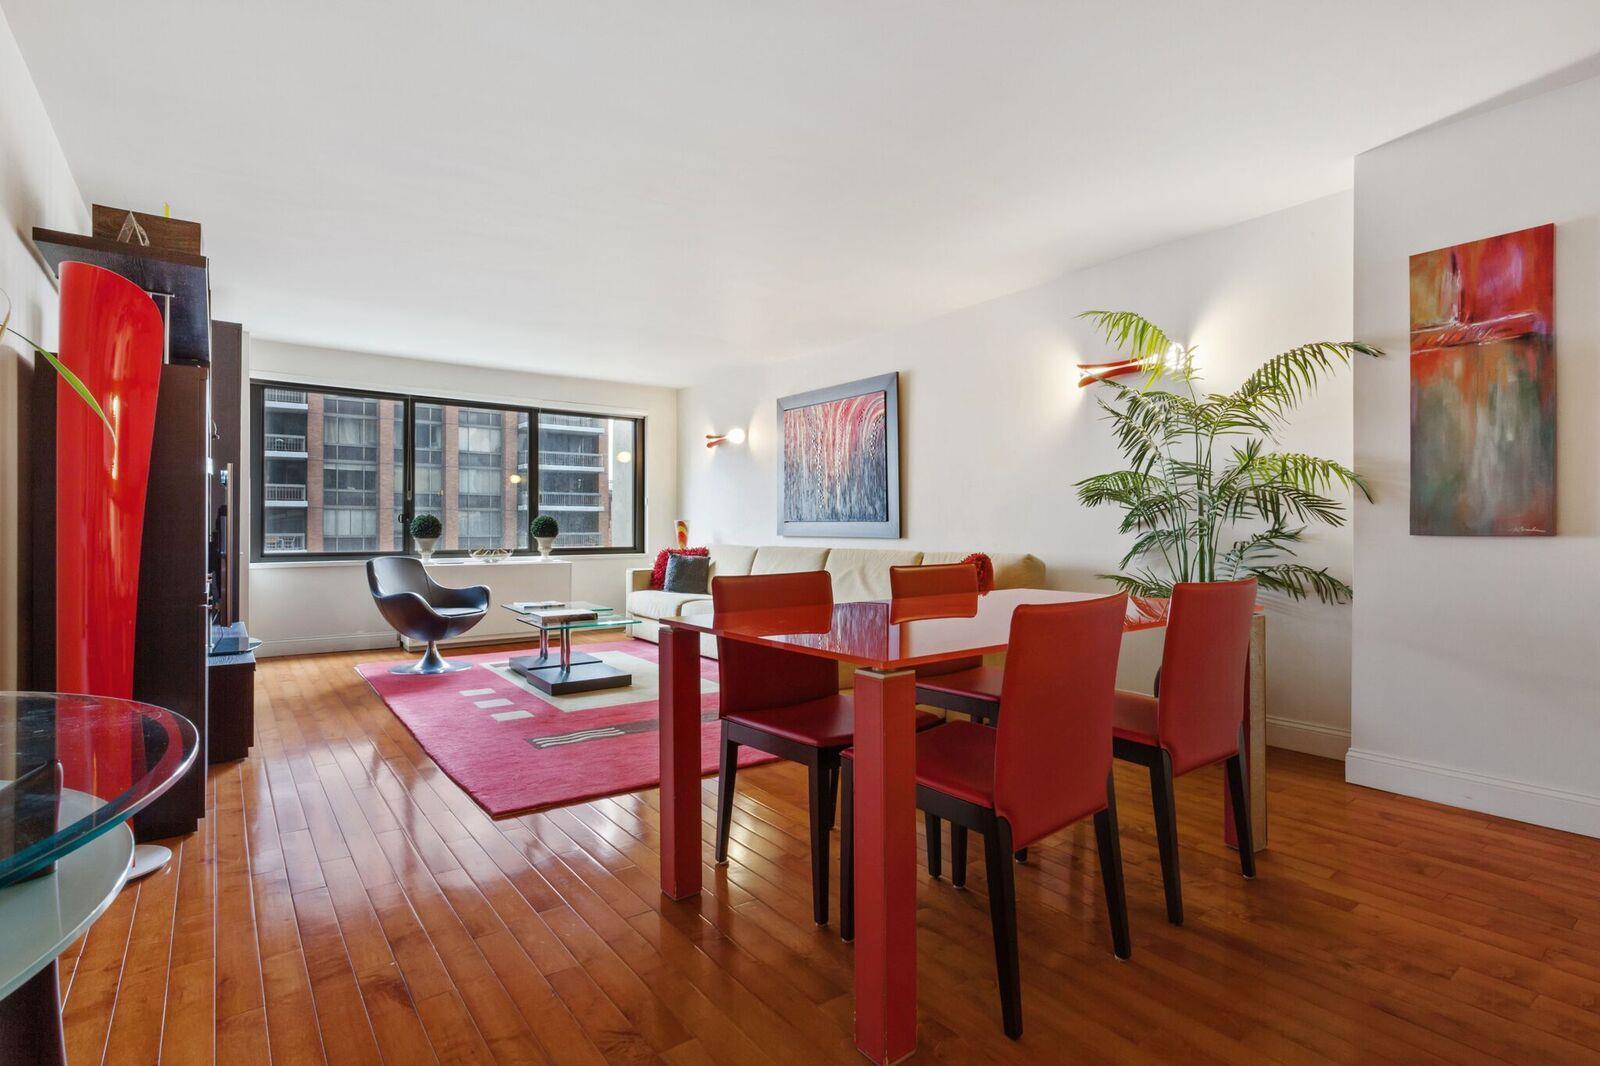 300 East 59th St, 803 - Upper East Side, New York